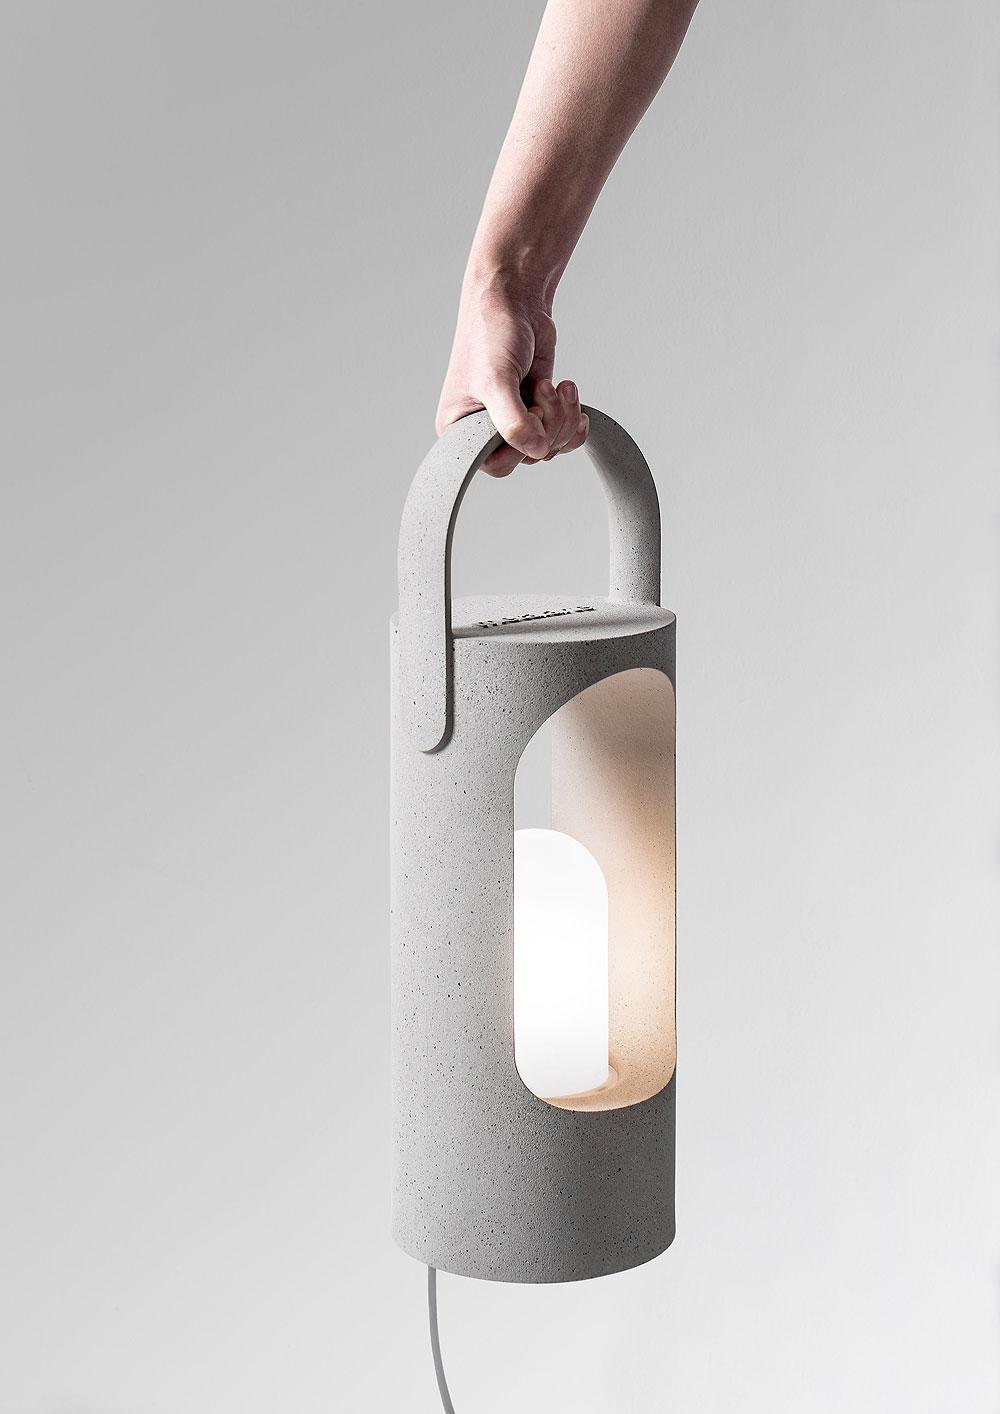 iluminacion-stones-rolling-ramon-ubeda-otto-canalda-metalarte (7)